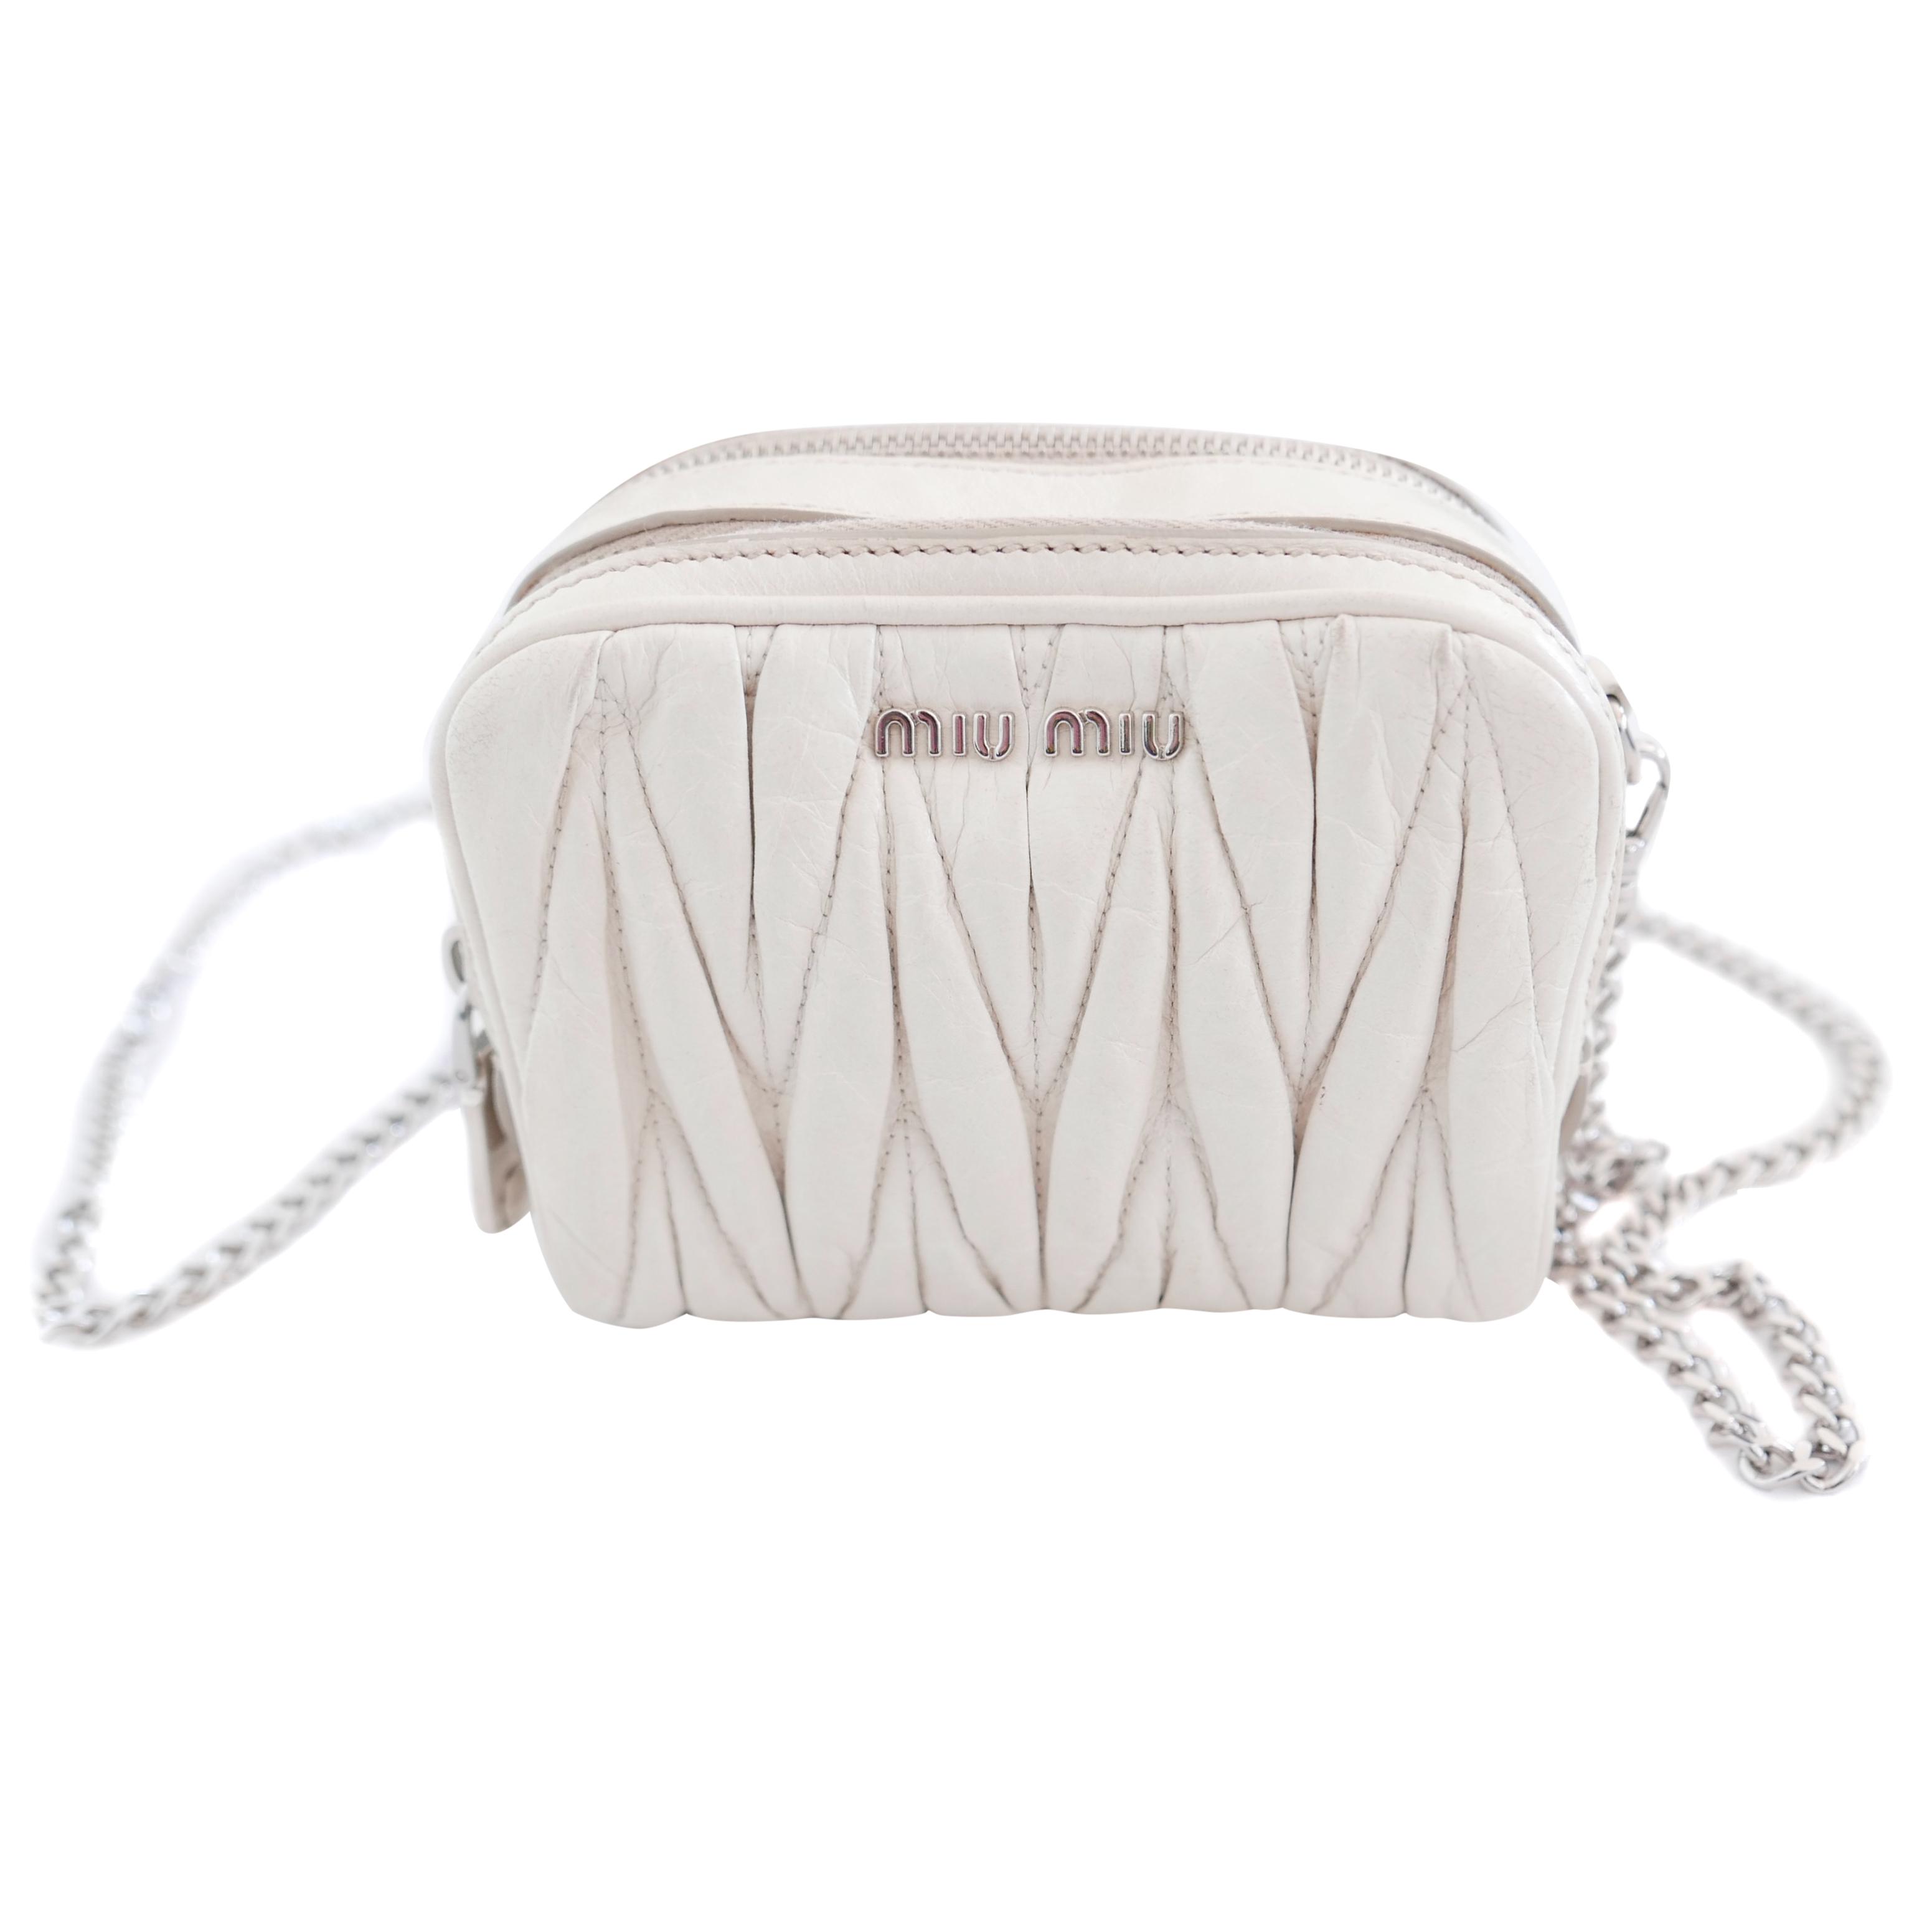 938ed91f9b64 Miu Miu Cammeo Matelasse Ivory Leather Mini Double Zip Bag